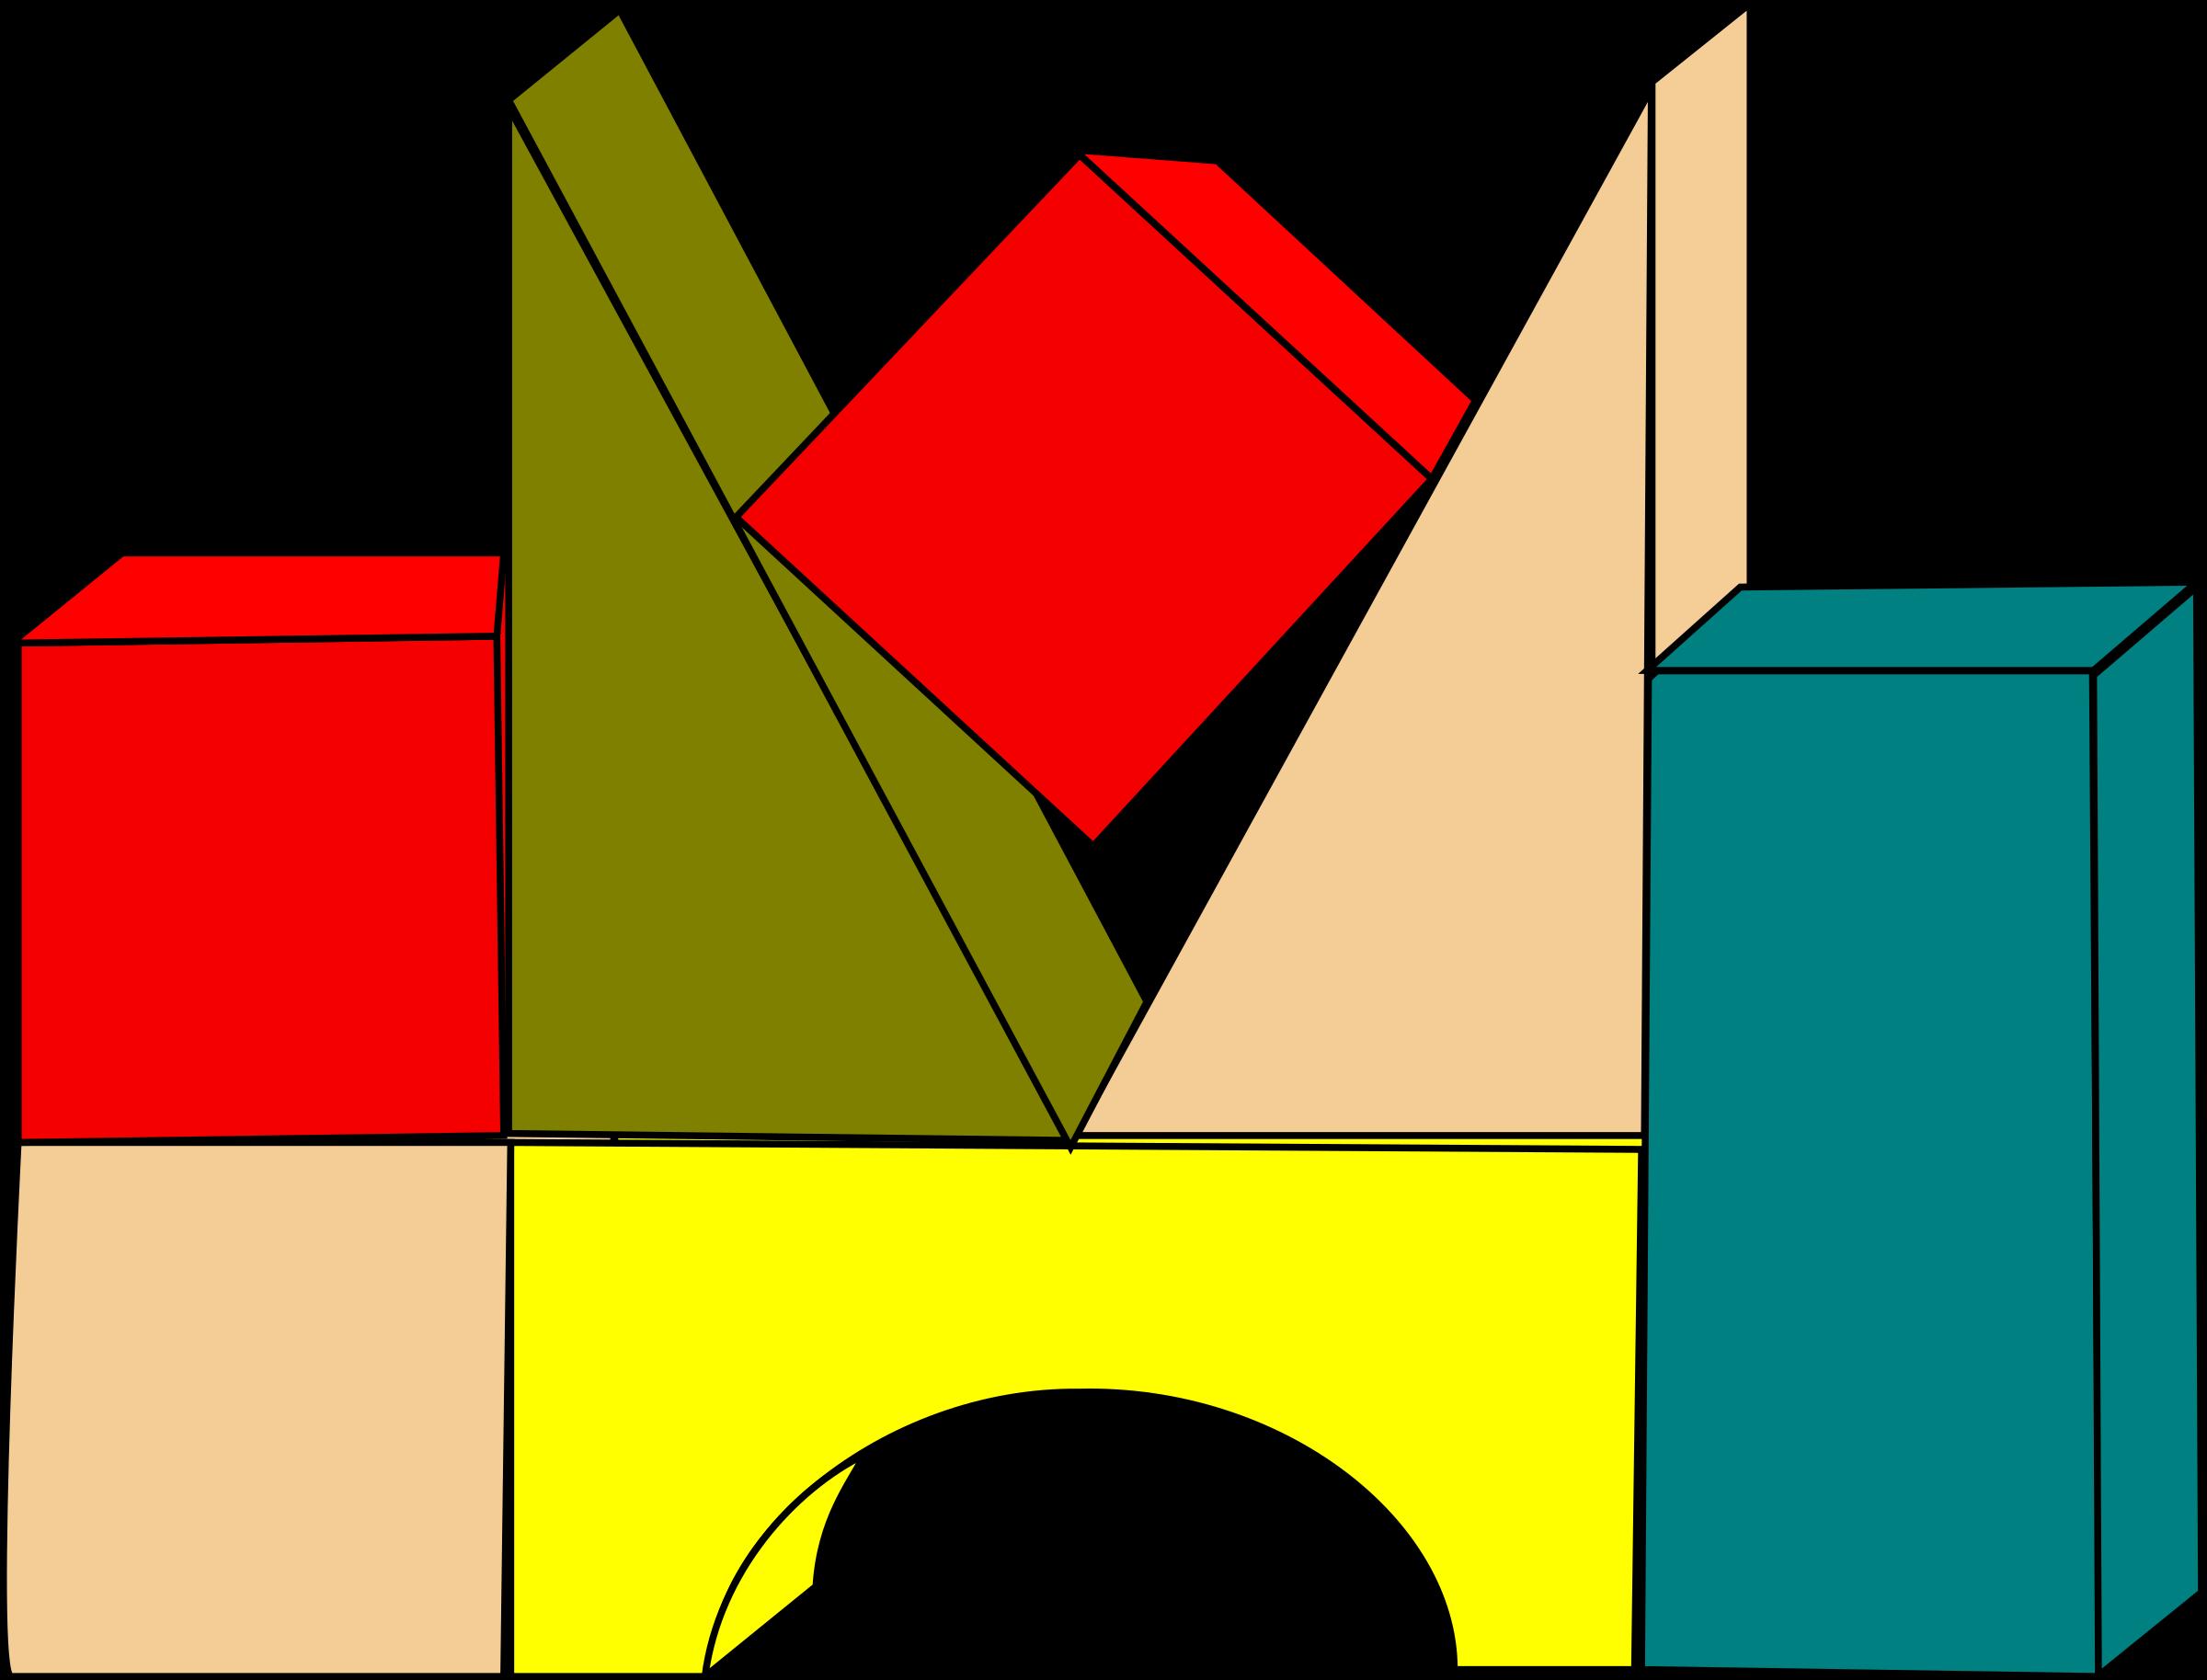 2400x1827 Abc Blocks Clipart Black And White Clip Art Library 5